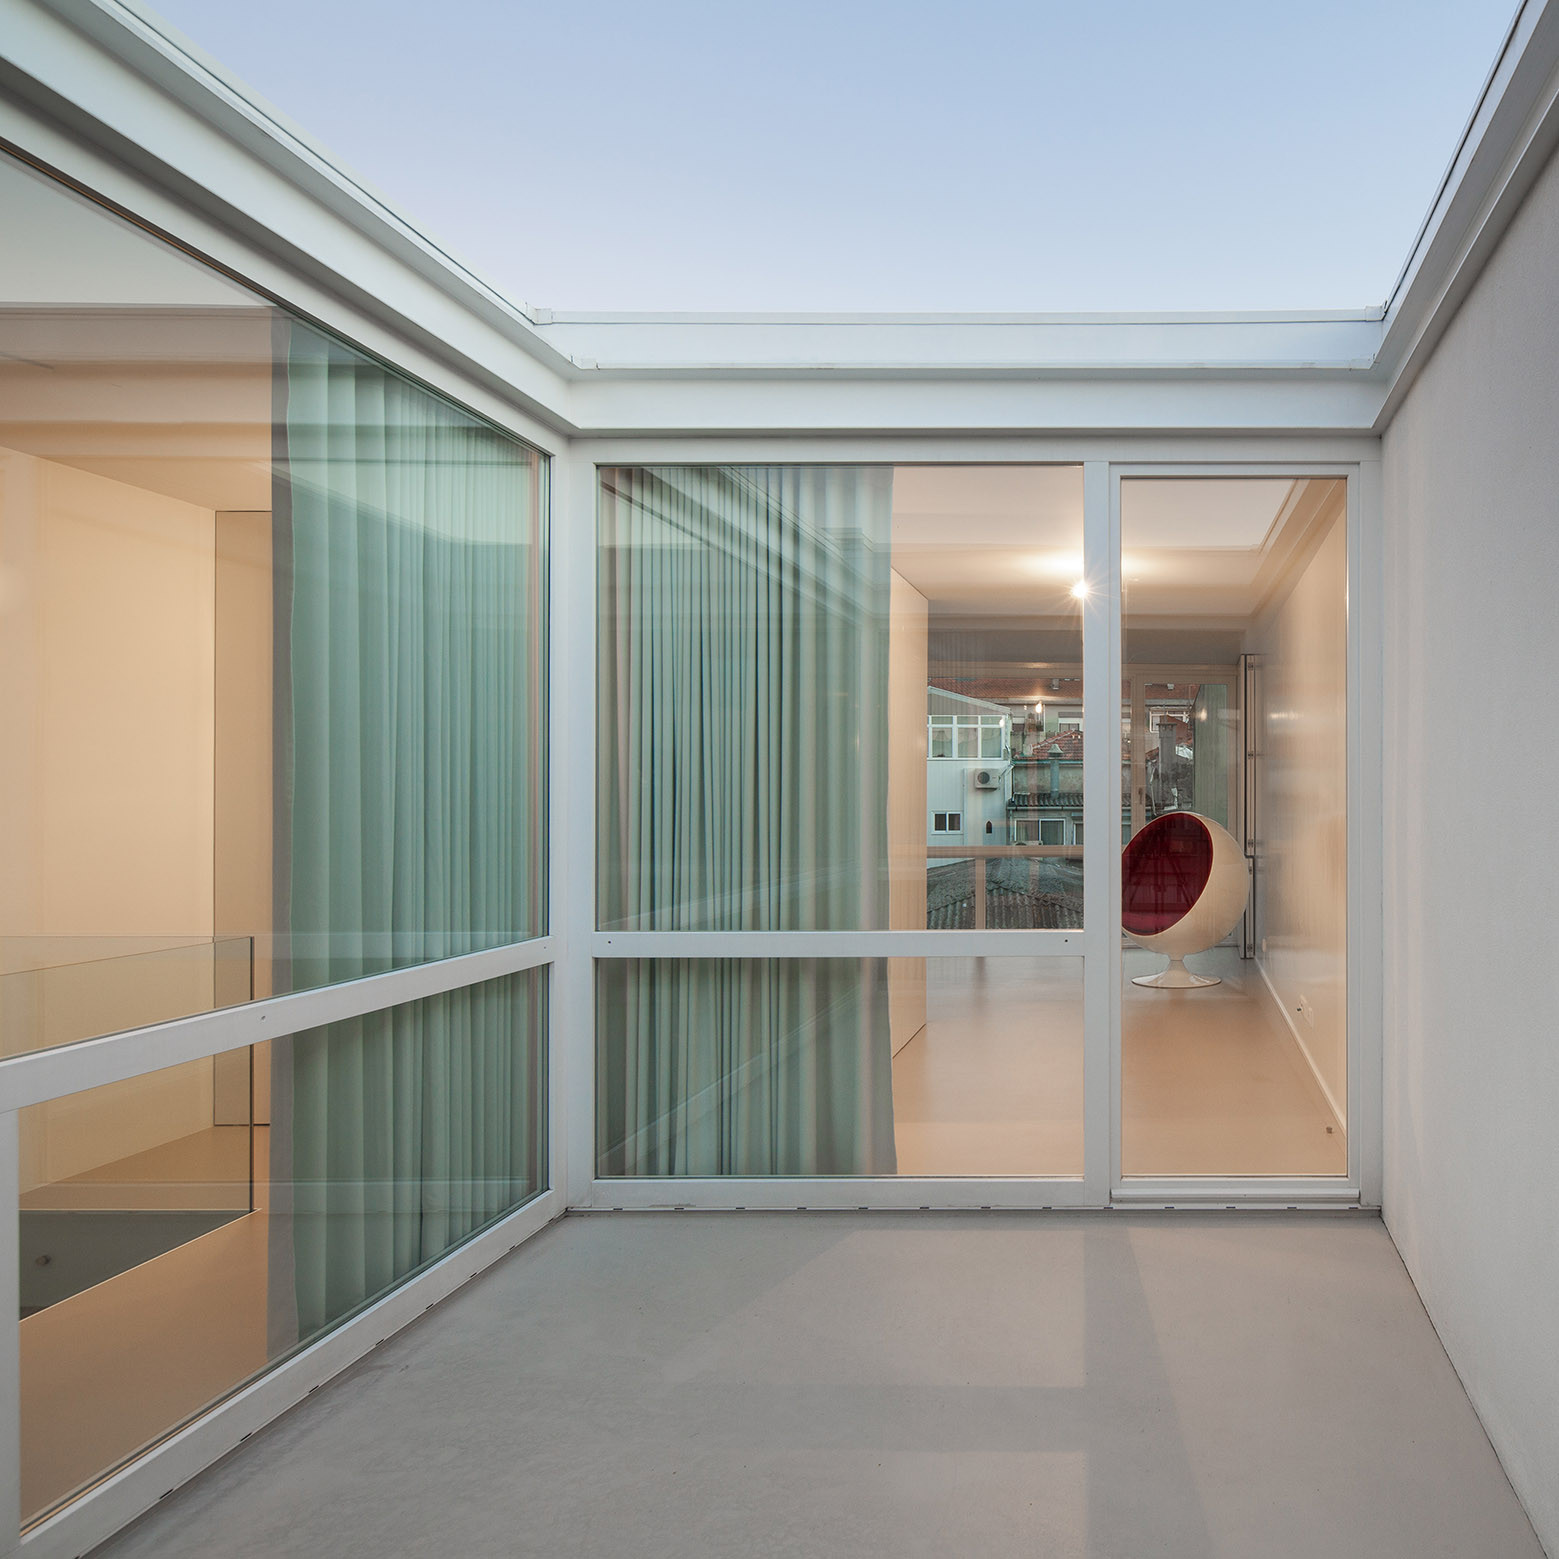 Casa Urbana en Rua do Lindo Vale / Ana Cláudia Monteiro + Vítor Oliveira